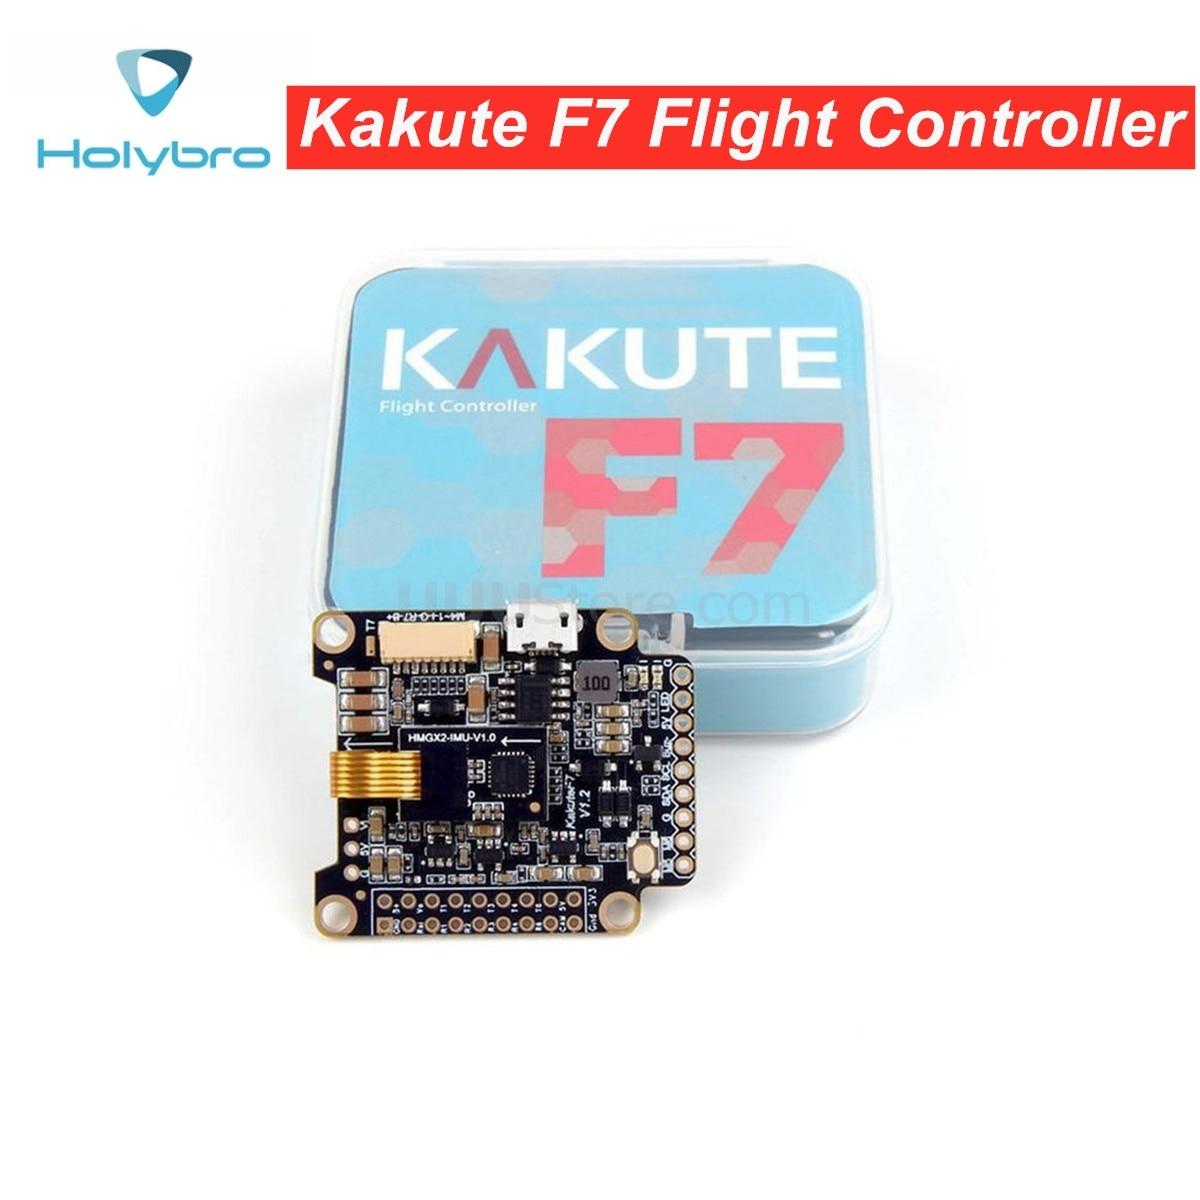 Holybro Kakute F7 Flight Controller STM32F745 FC Modul W/ OSD Barometer RC FPV Racing Drone Quadcopter Zubehör